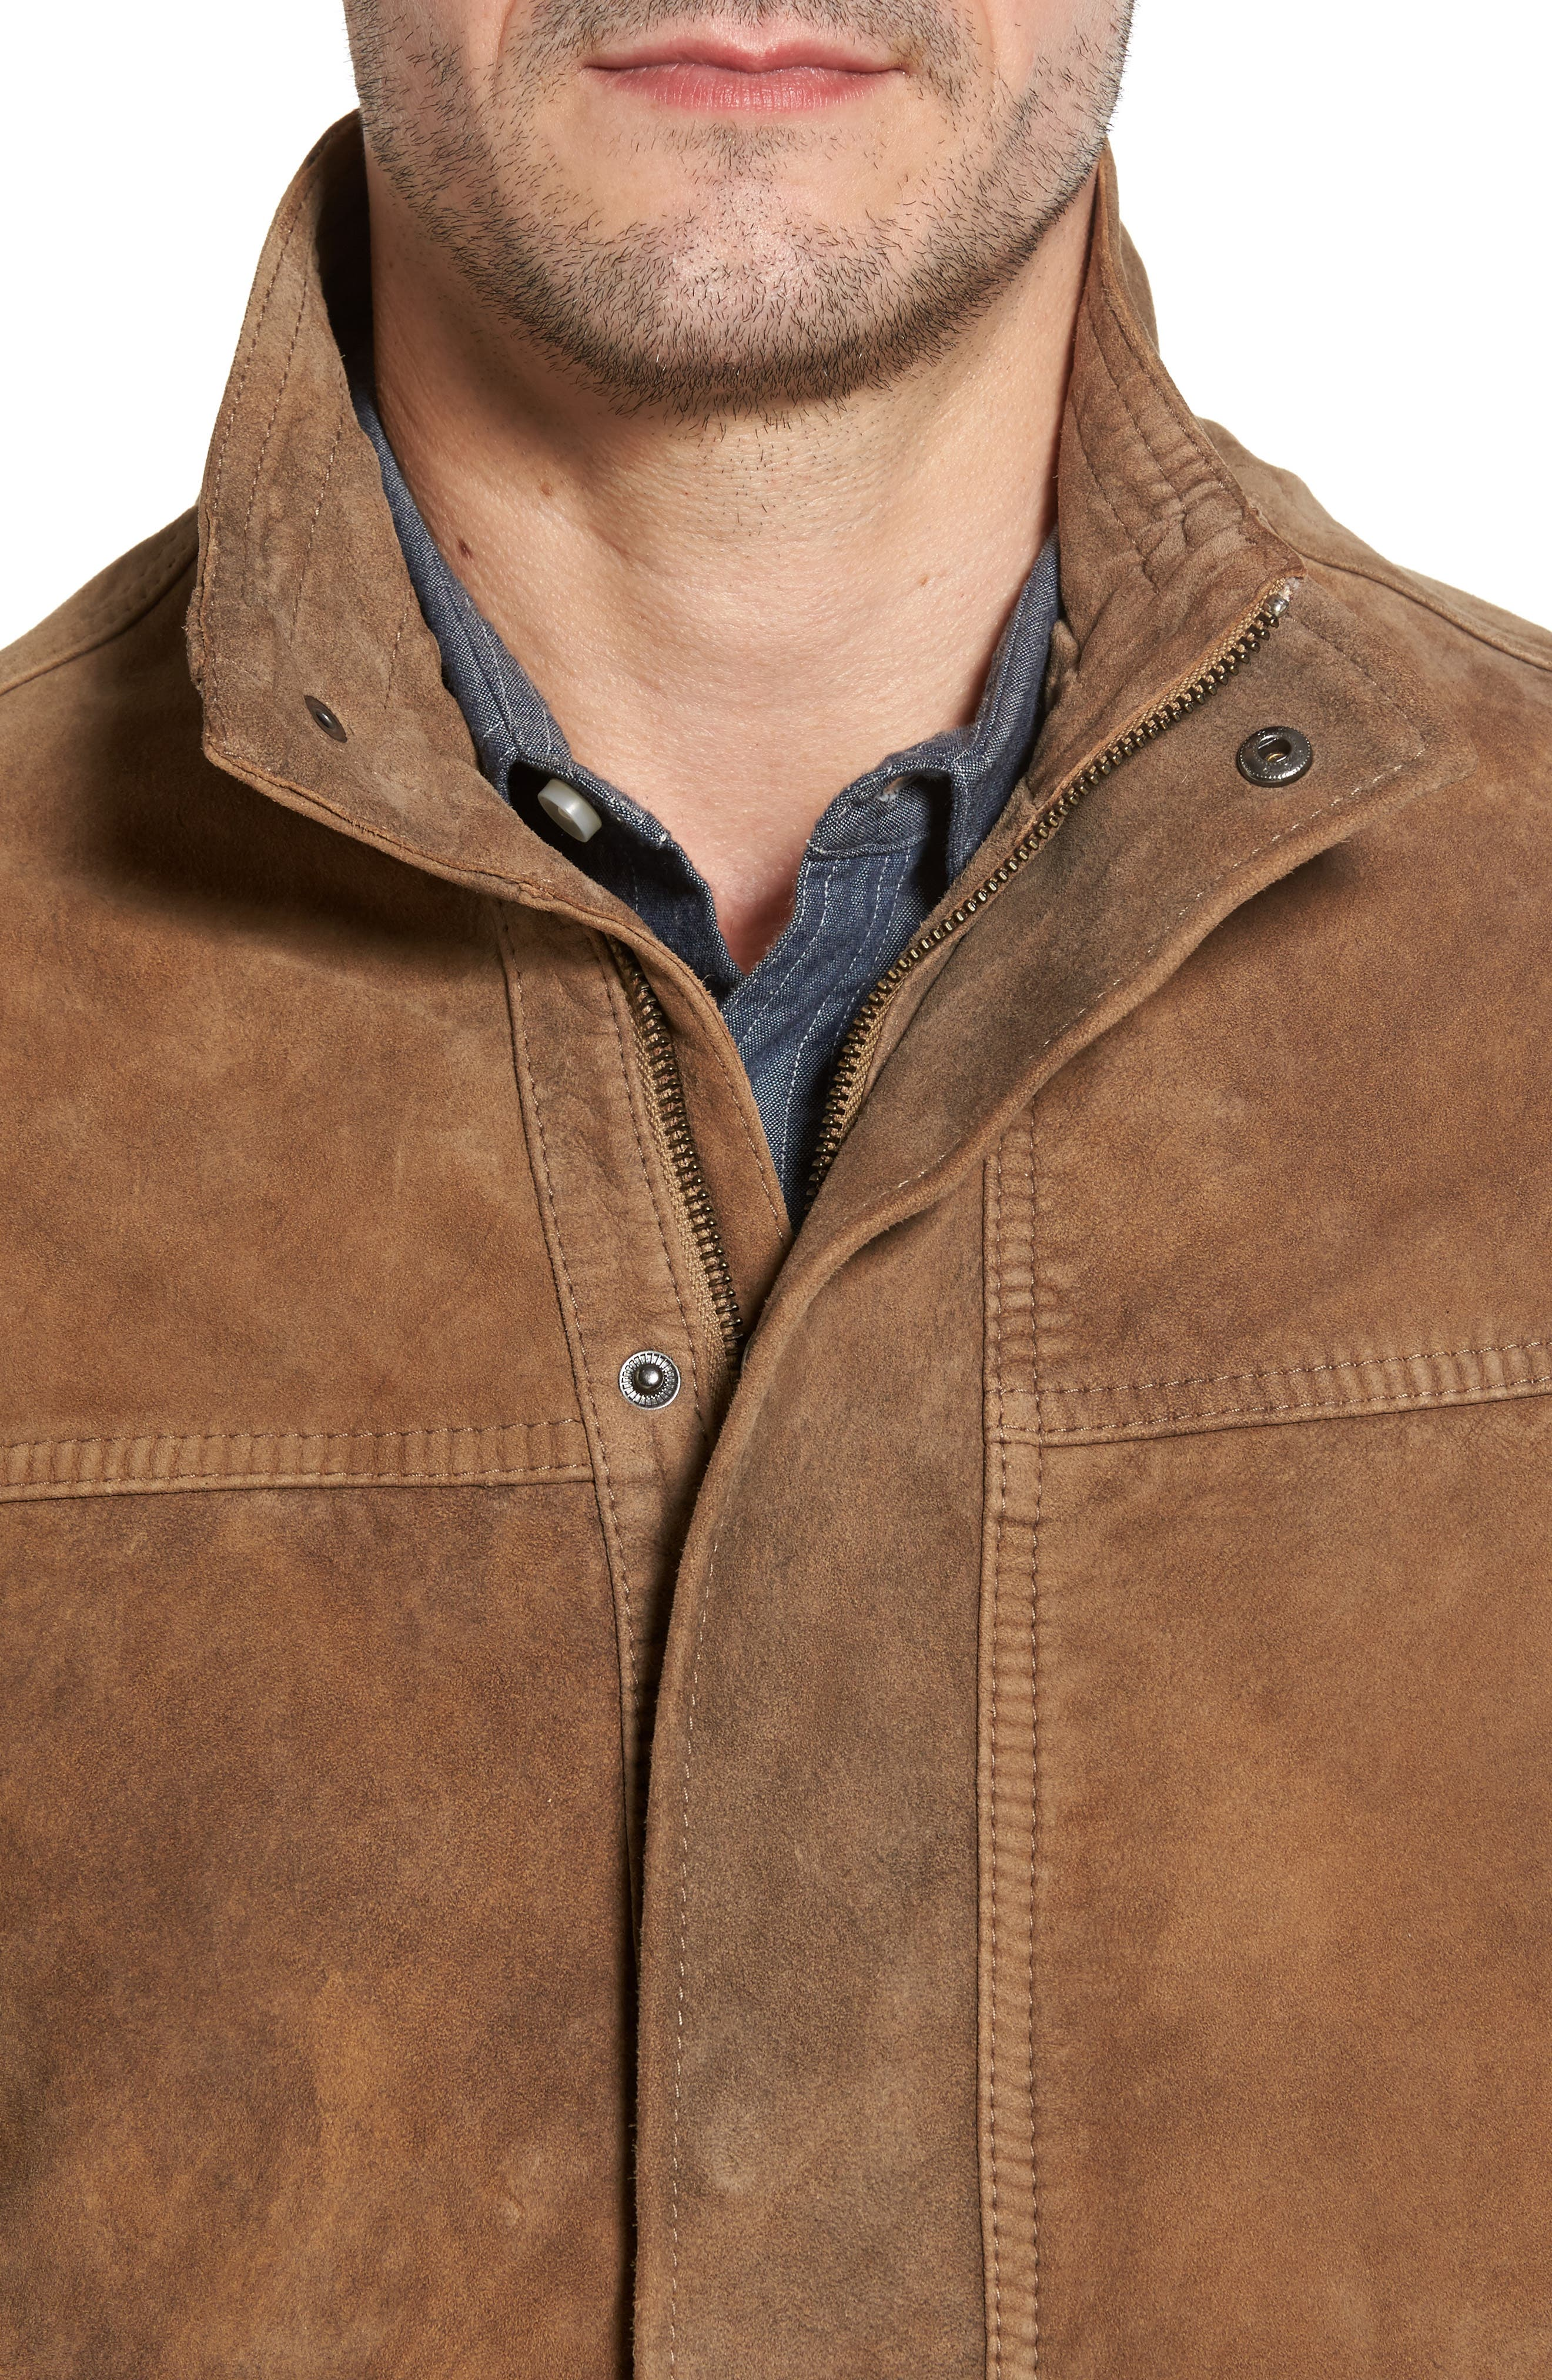 Lambskin Suede Jacket,                             Alternate thumbnail 4, color,                             210